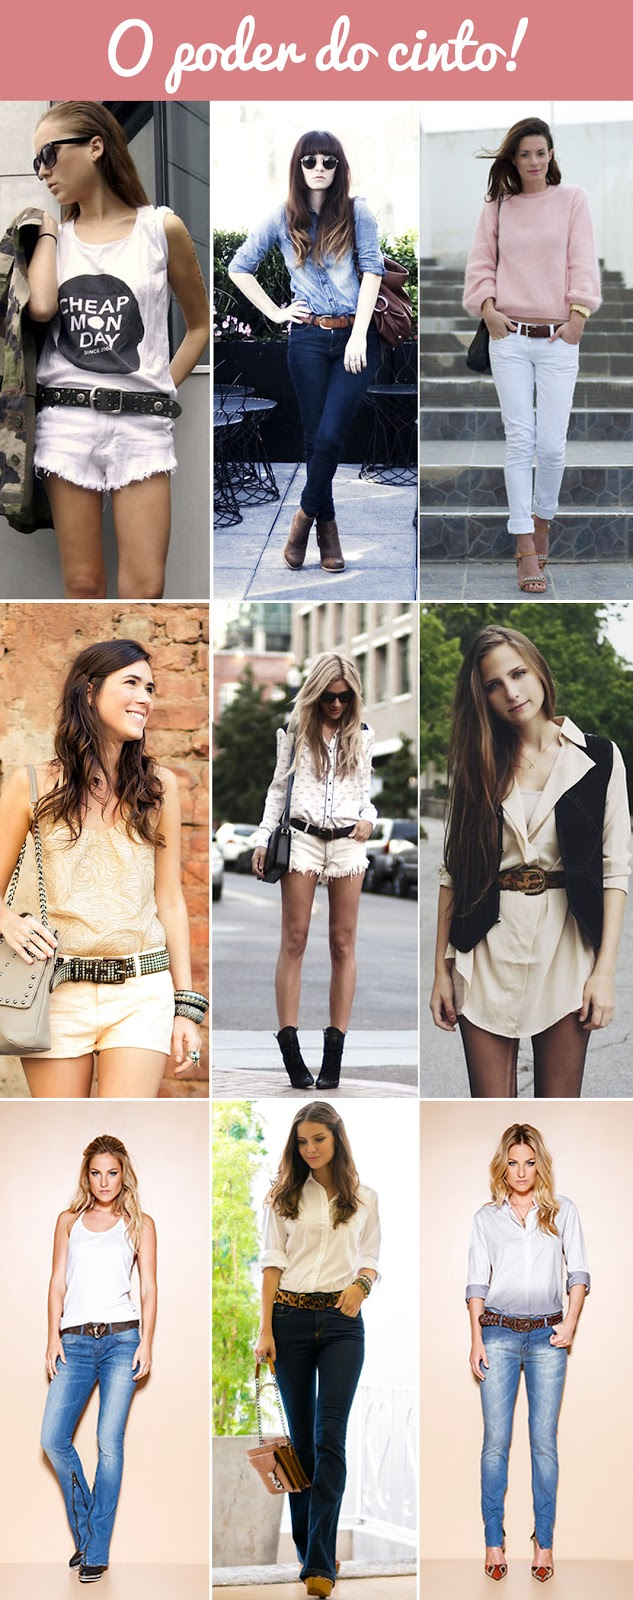 Básico, cool, boho chic, elegante, fashion, moda, produção, animale,